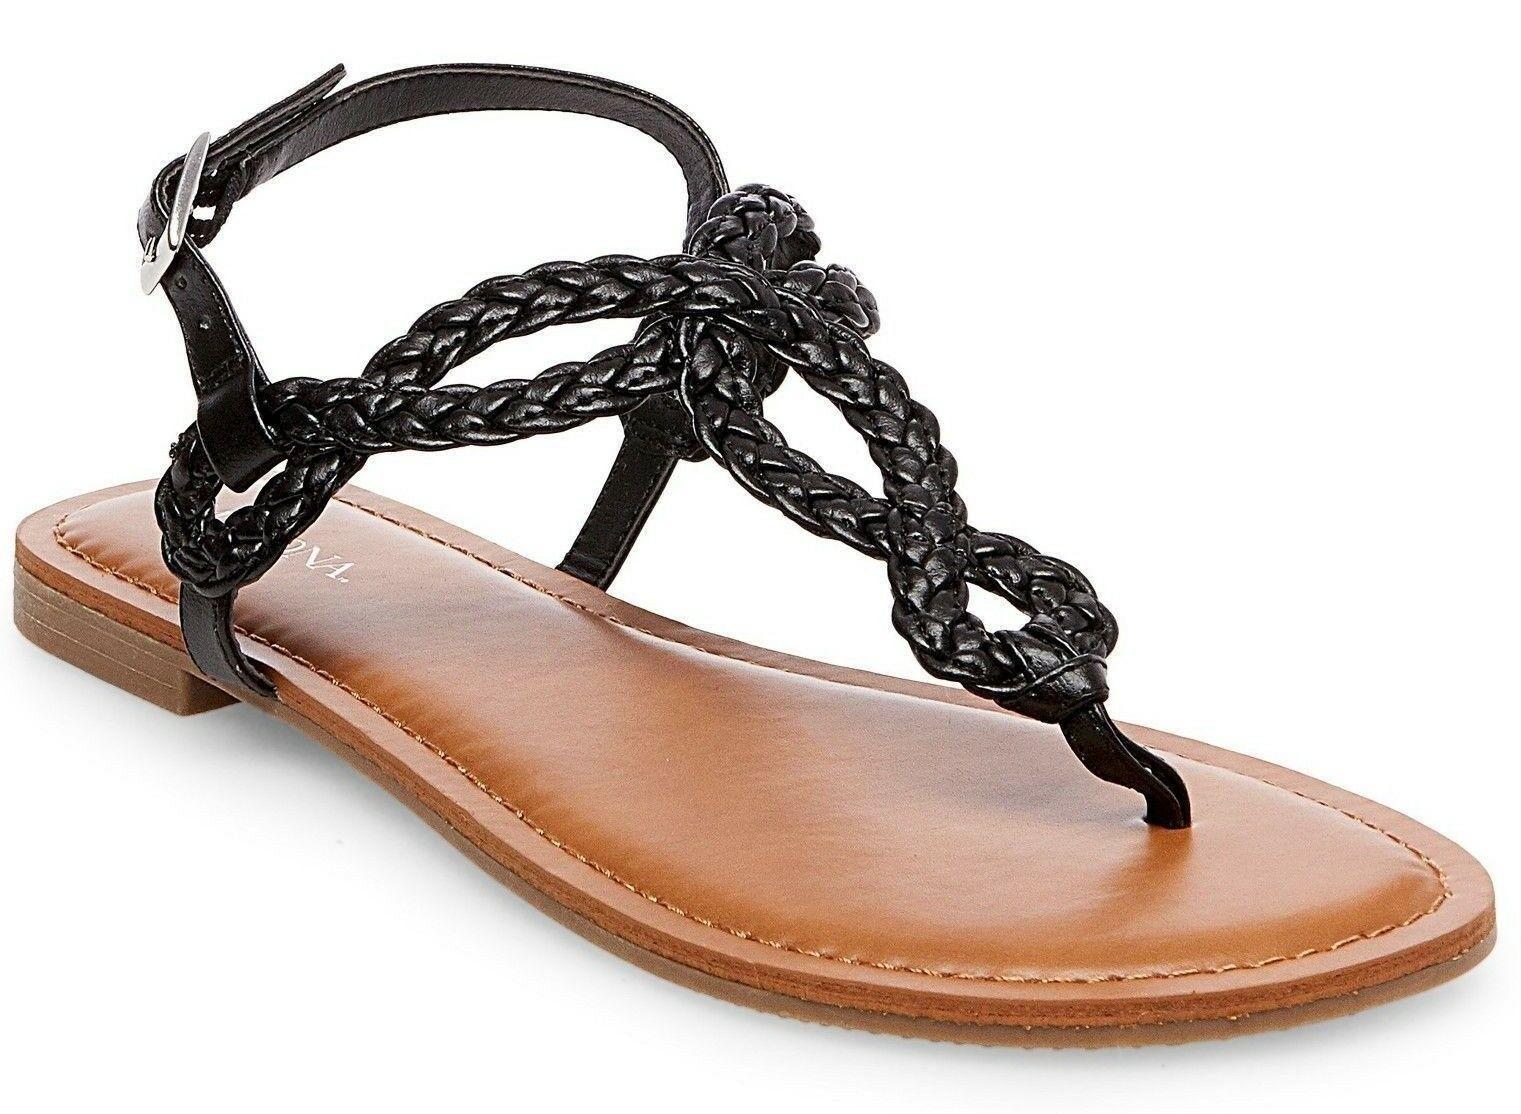 New Women's Merona Jana Quarter Strap Flat Strappy Sandals in Black NWT